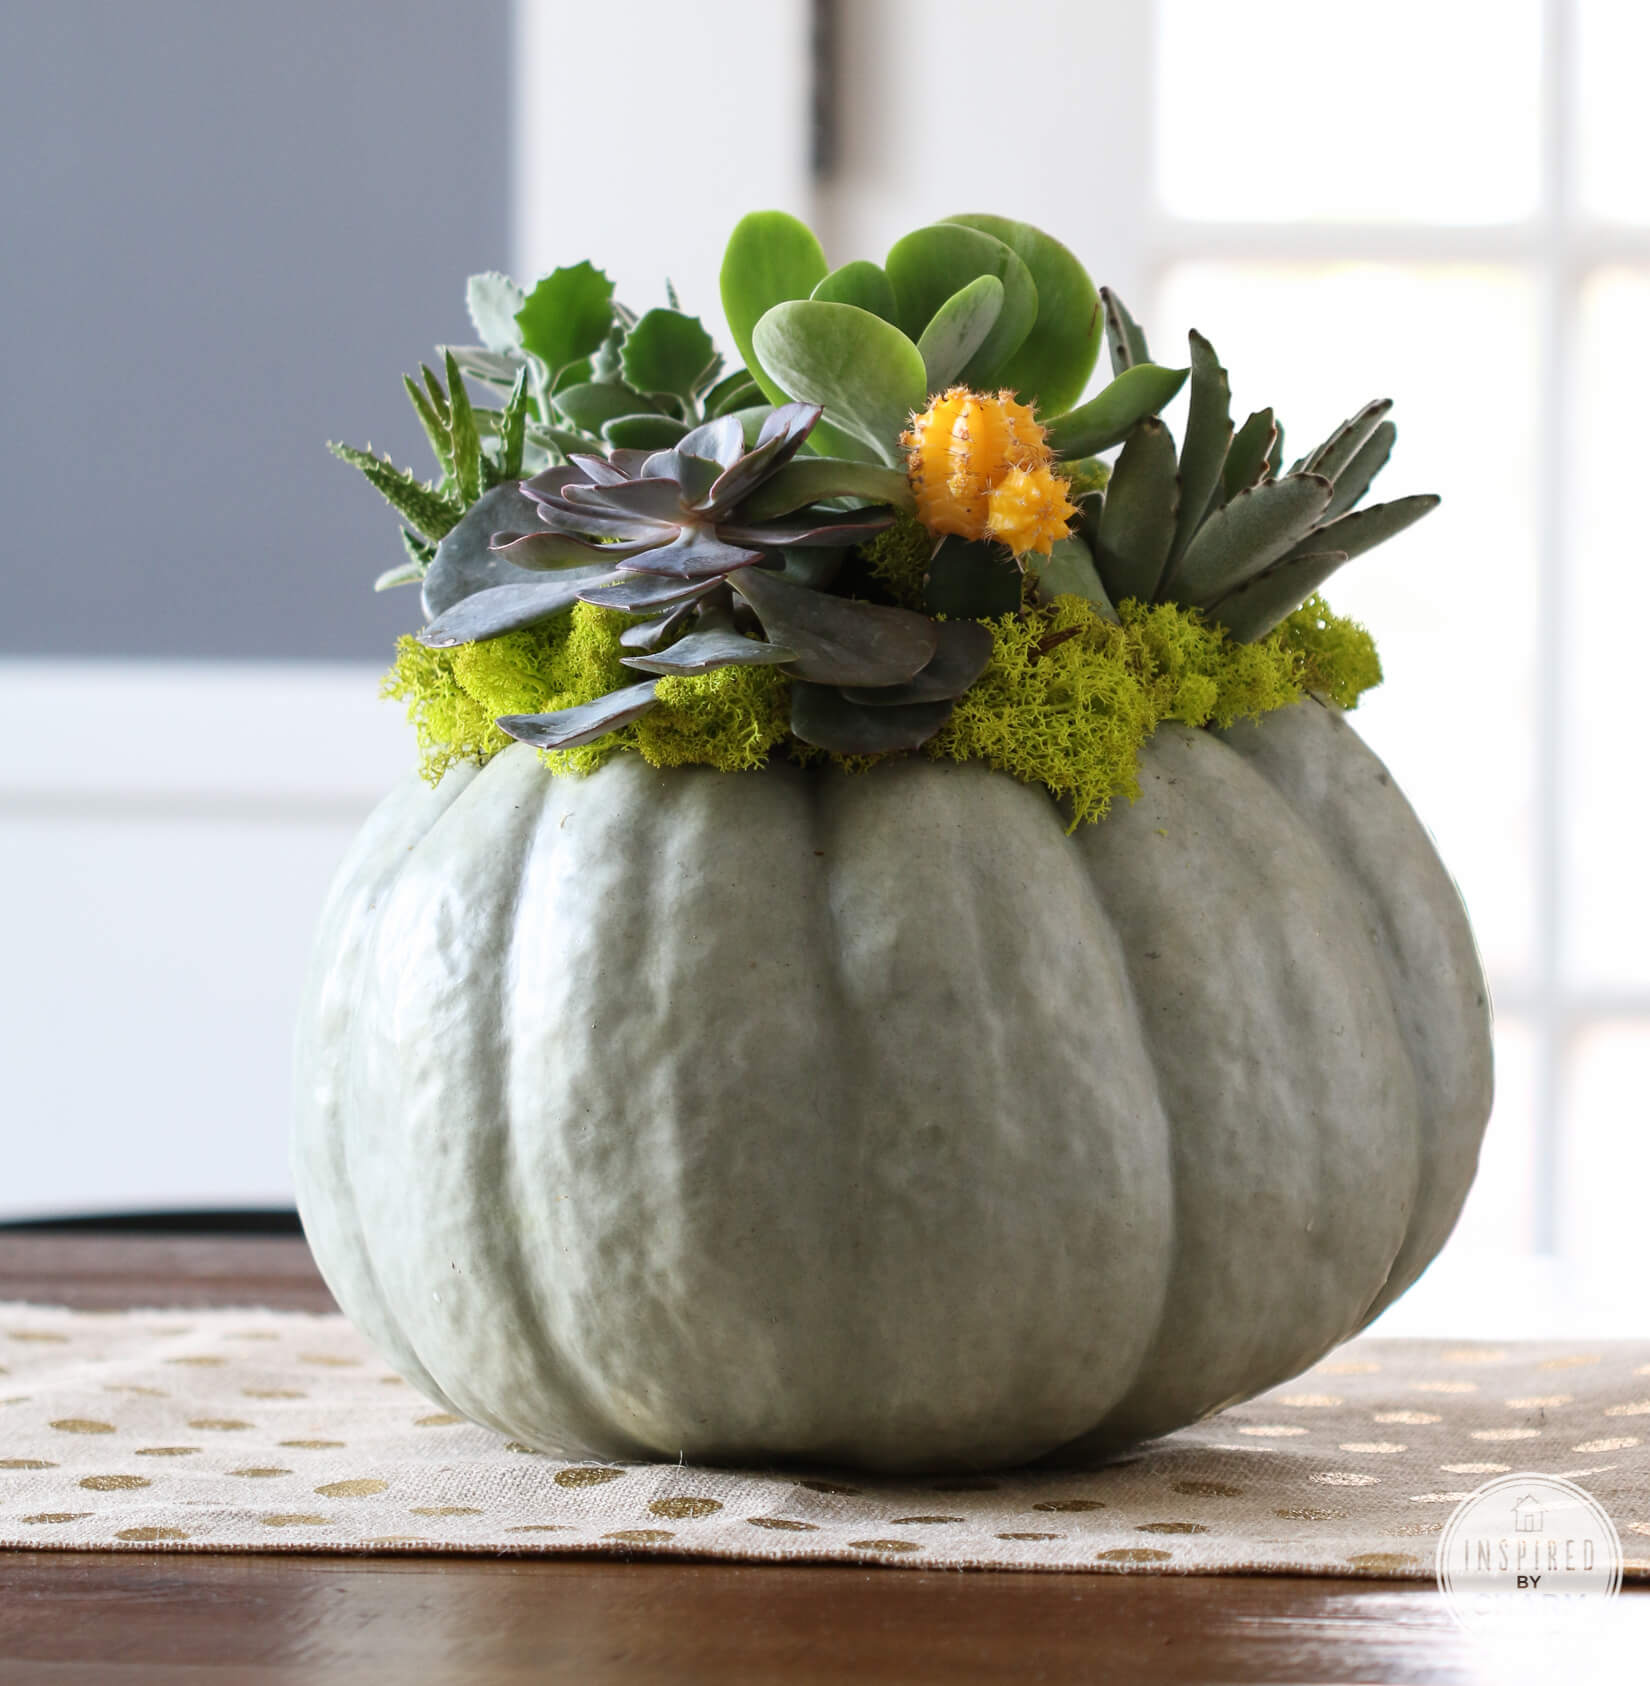 Fall inspired pumpkin succulent decor for a home interior